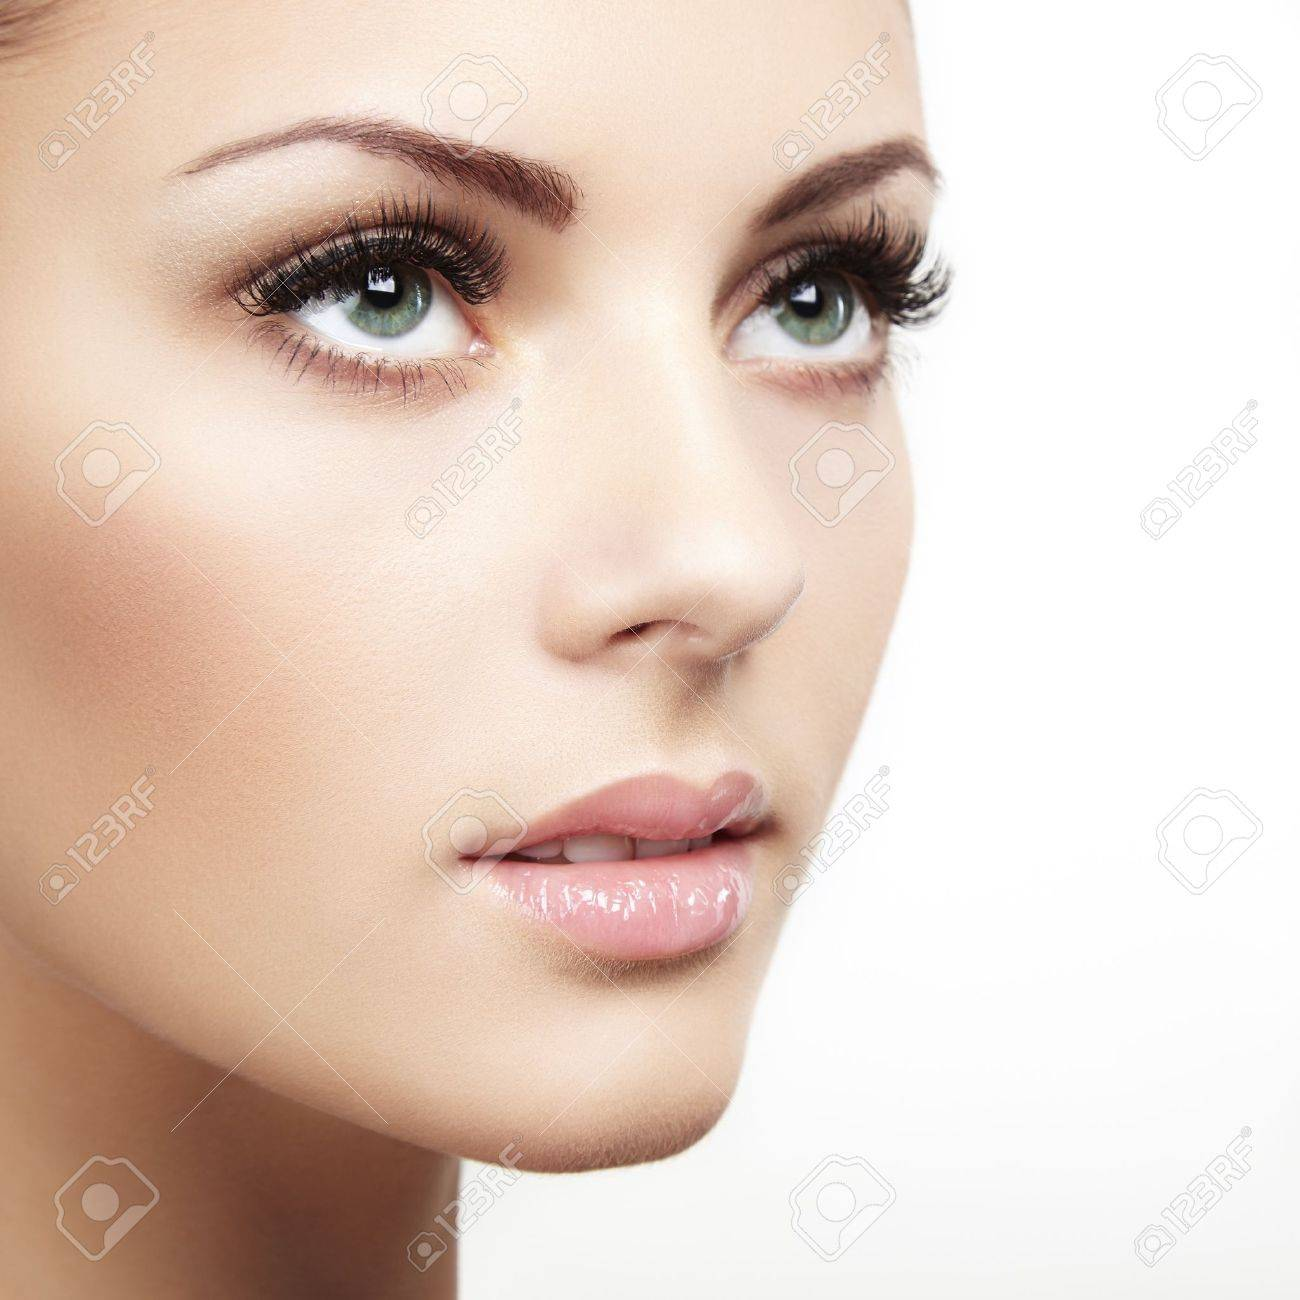 ===La mujer, un bello rostro...=== - Página 4 19025536-beautiful-woman-face-perfect-makeup-beauty-fashion-Stock-Photo